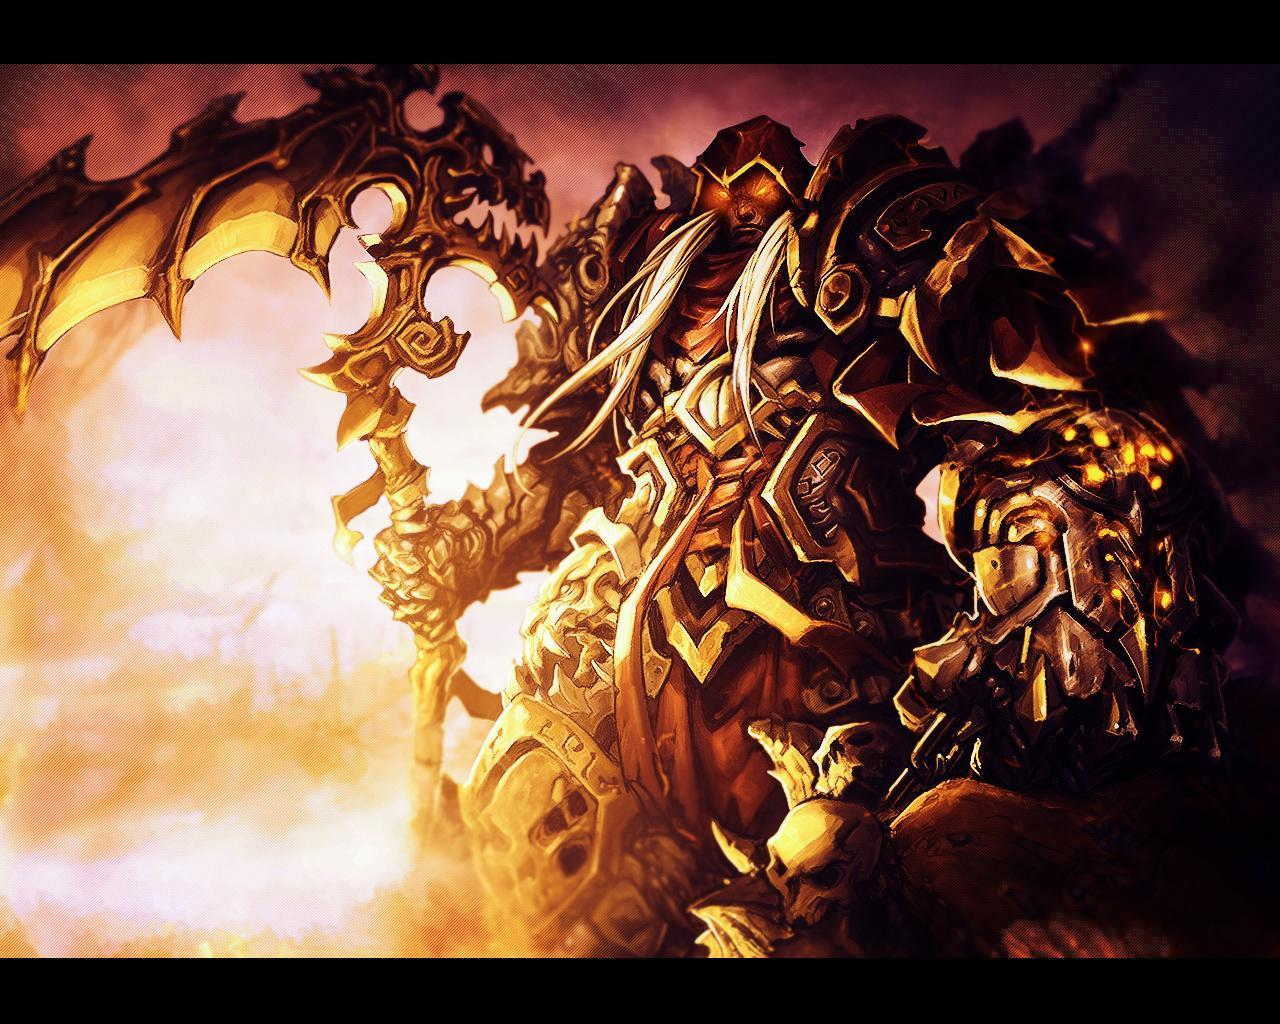 Darksiders War Wallpaper By: Darksiders Wallpapers